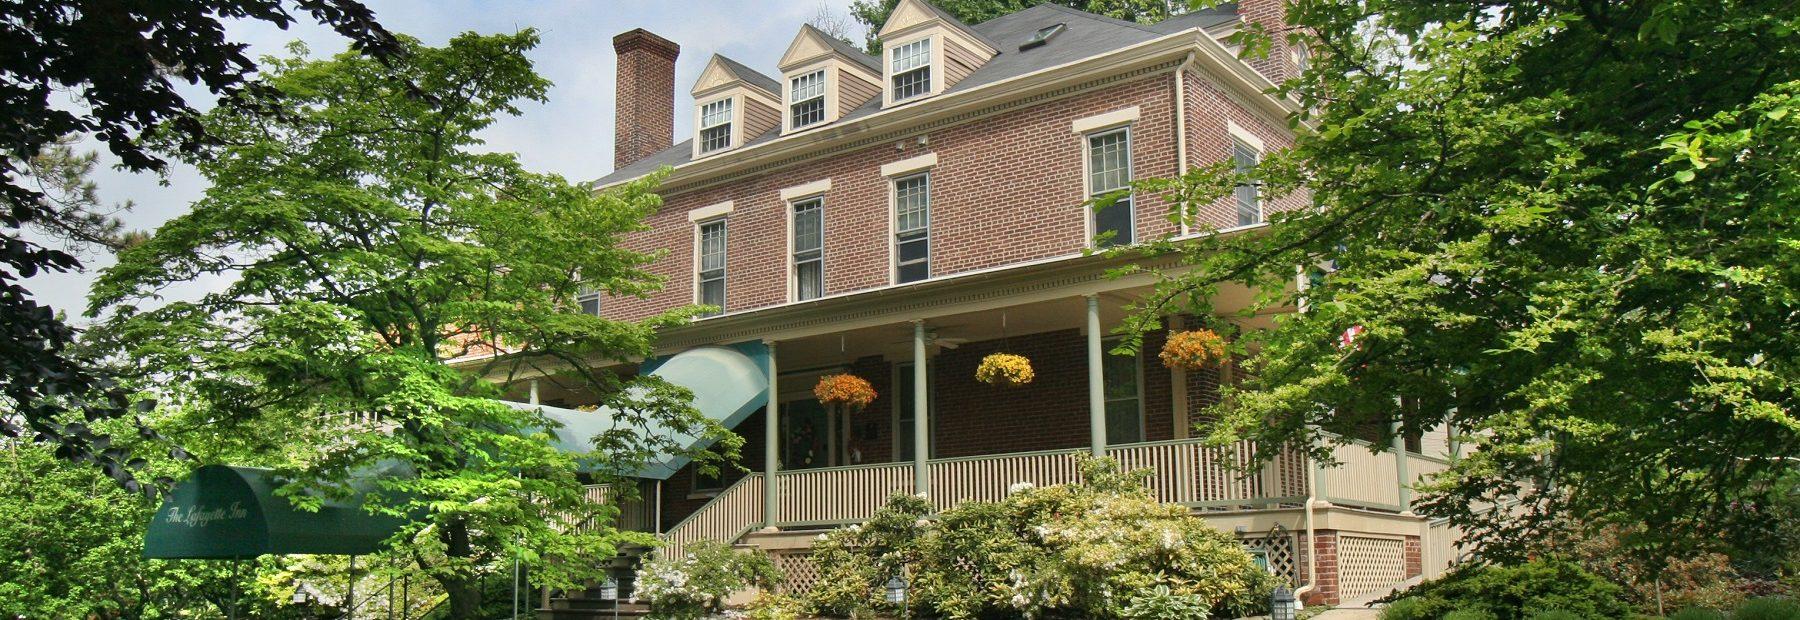 Lafayette Inn Front Exterior